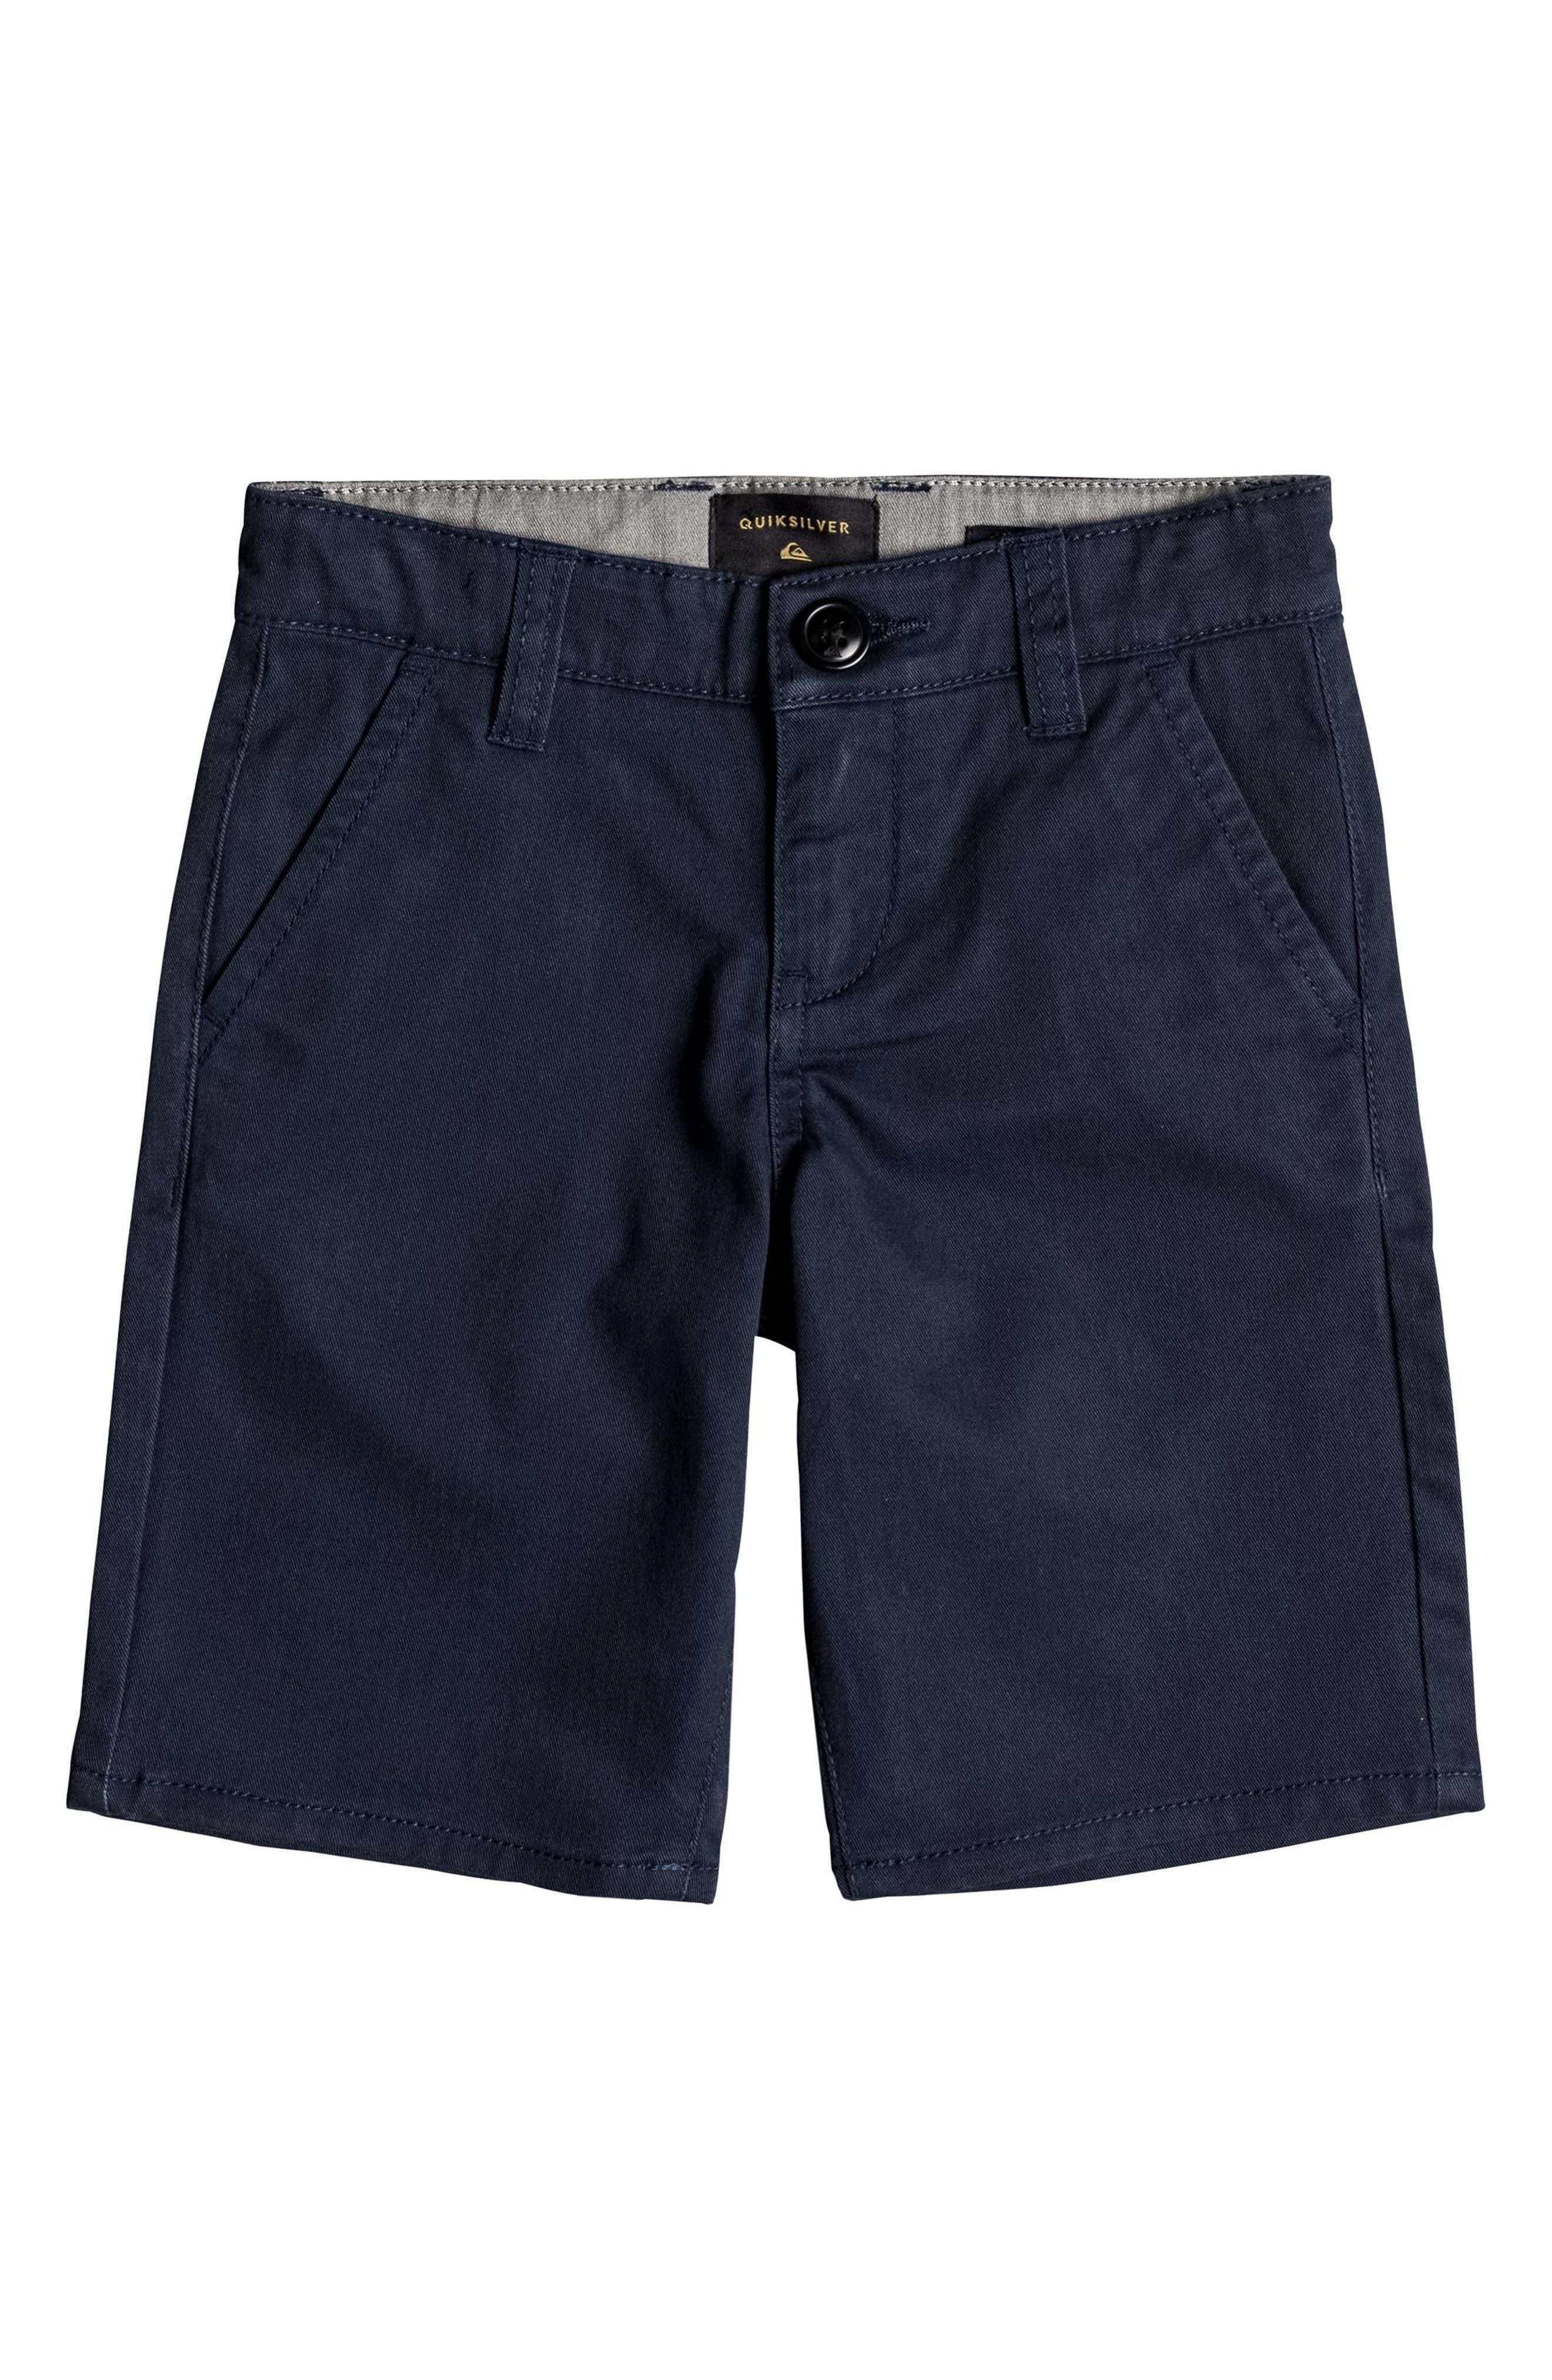 Everyday Union Stretch Shorts,                         Main,                         color, Navy Blazer